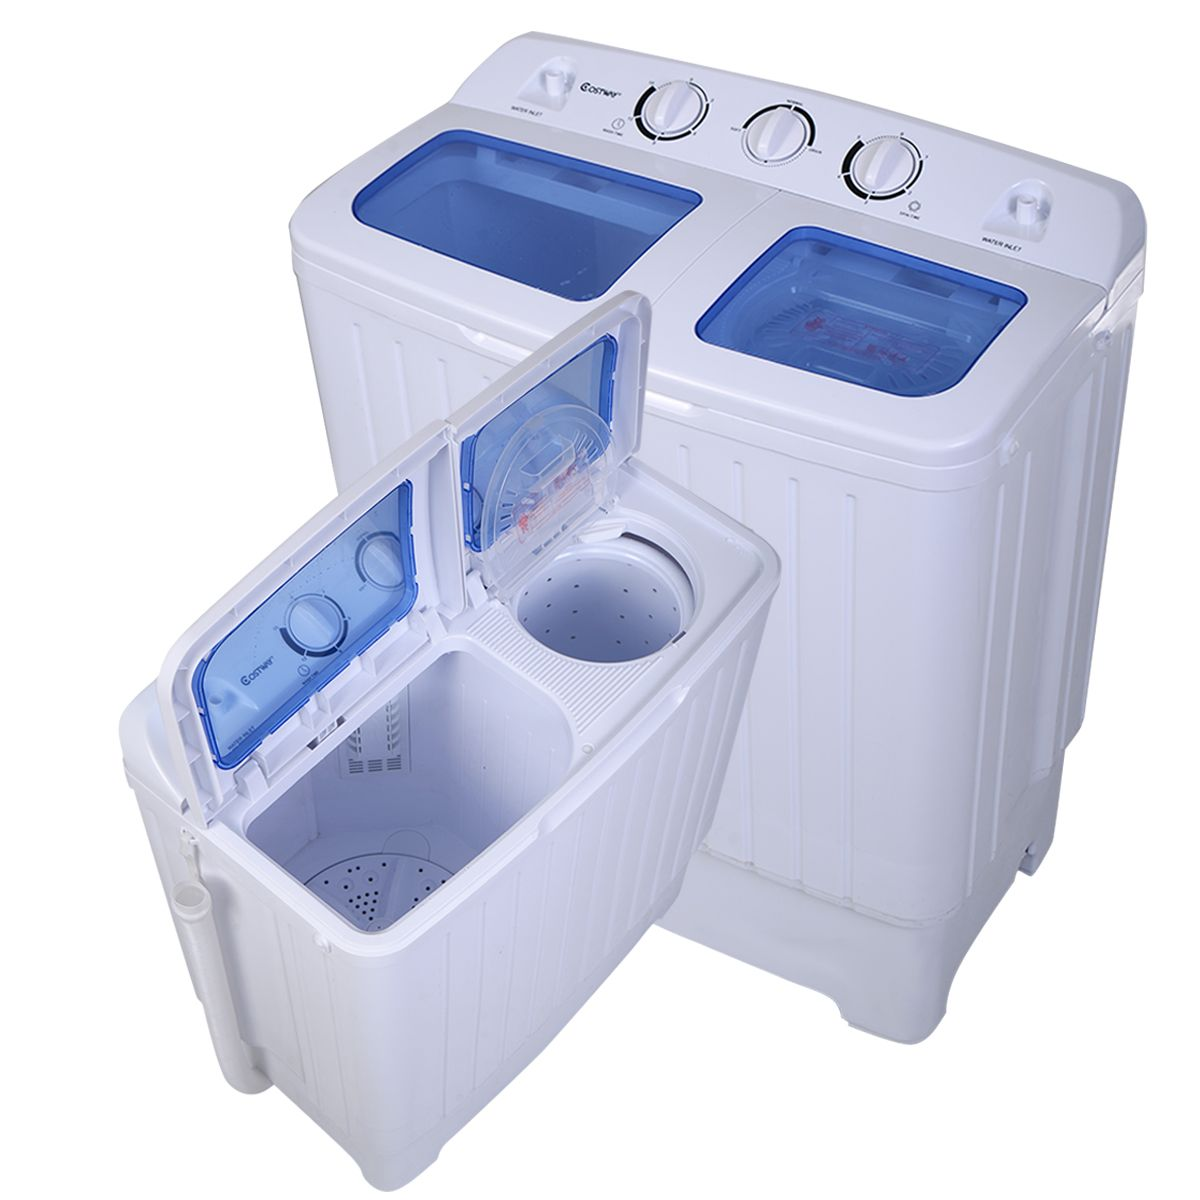 Emejing Small Washing Machine For Apartment Photos - Decorating ...